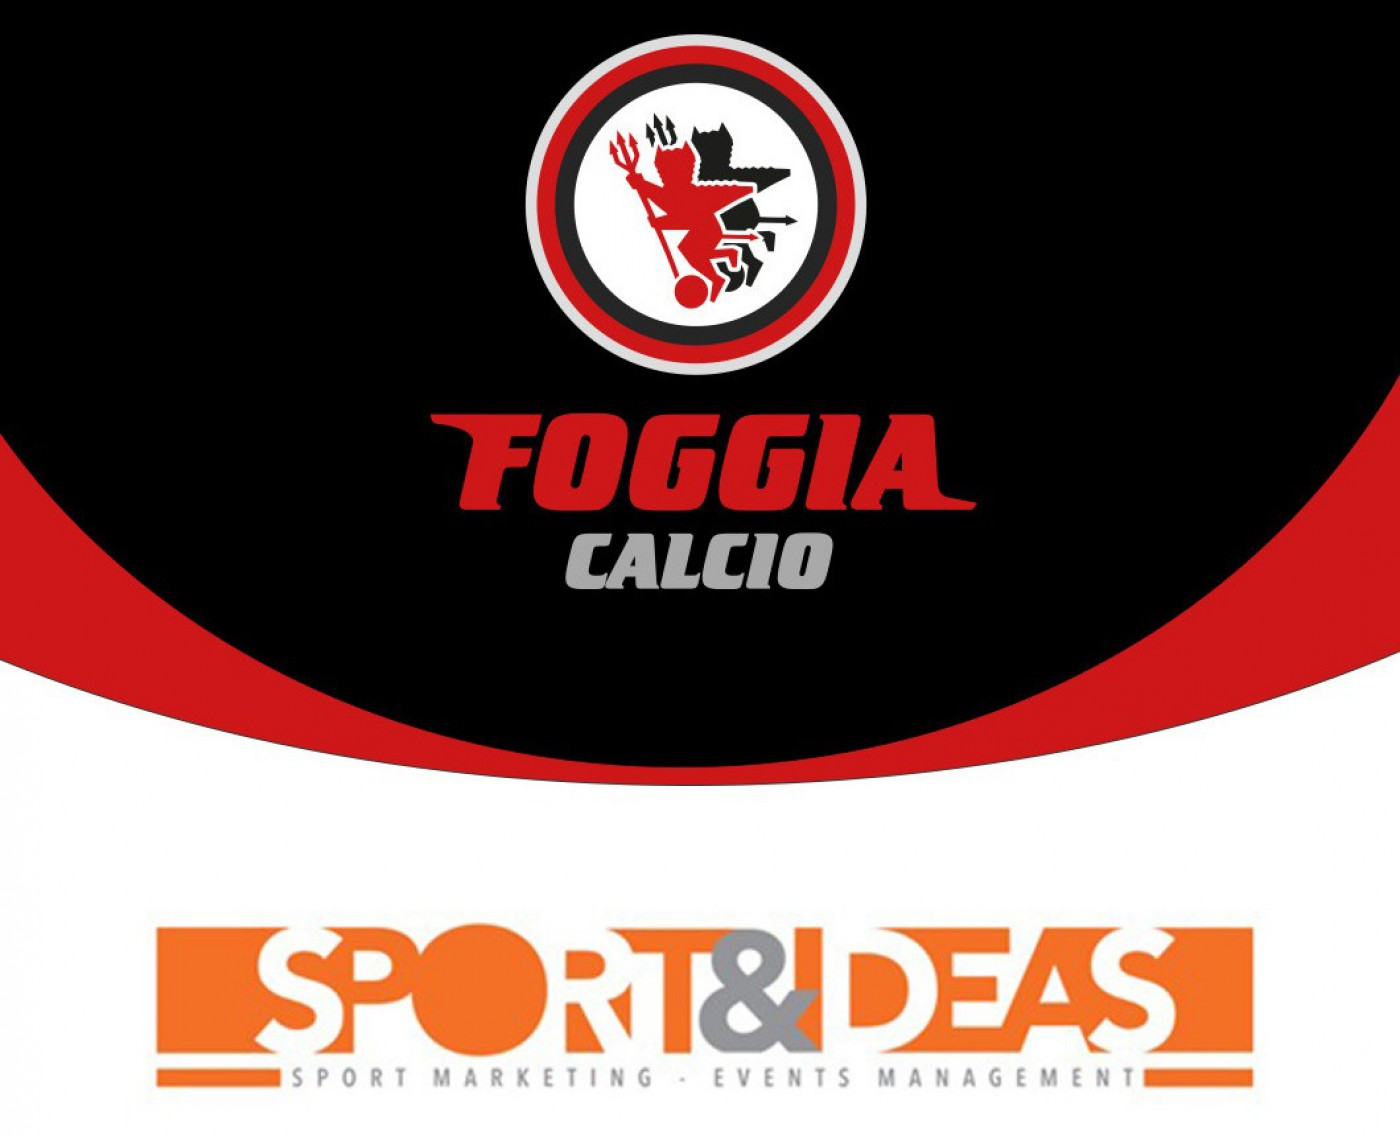 SPORT&IDEAS marketing Advisor del Foggia Calcio - Sport Business Management